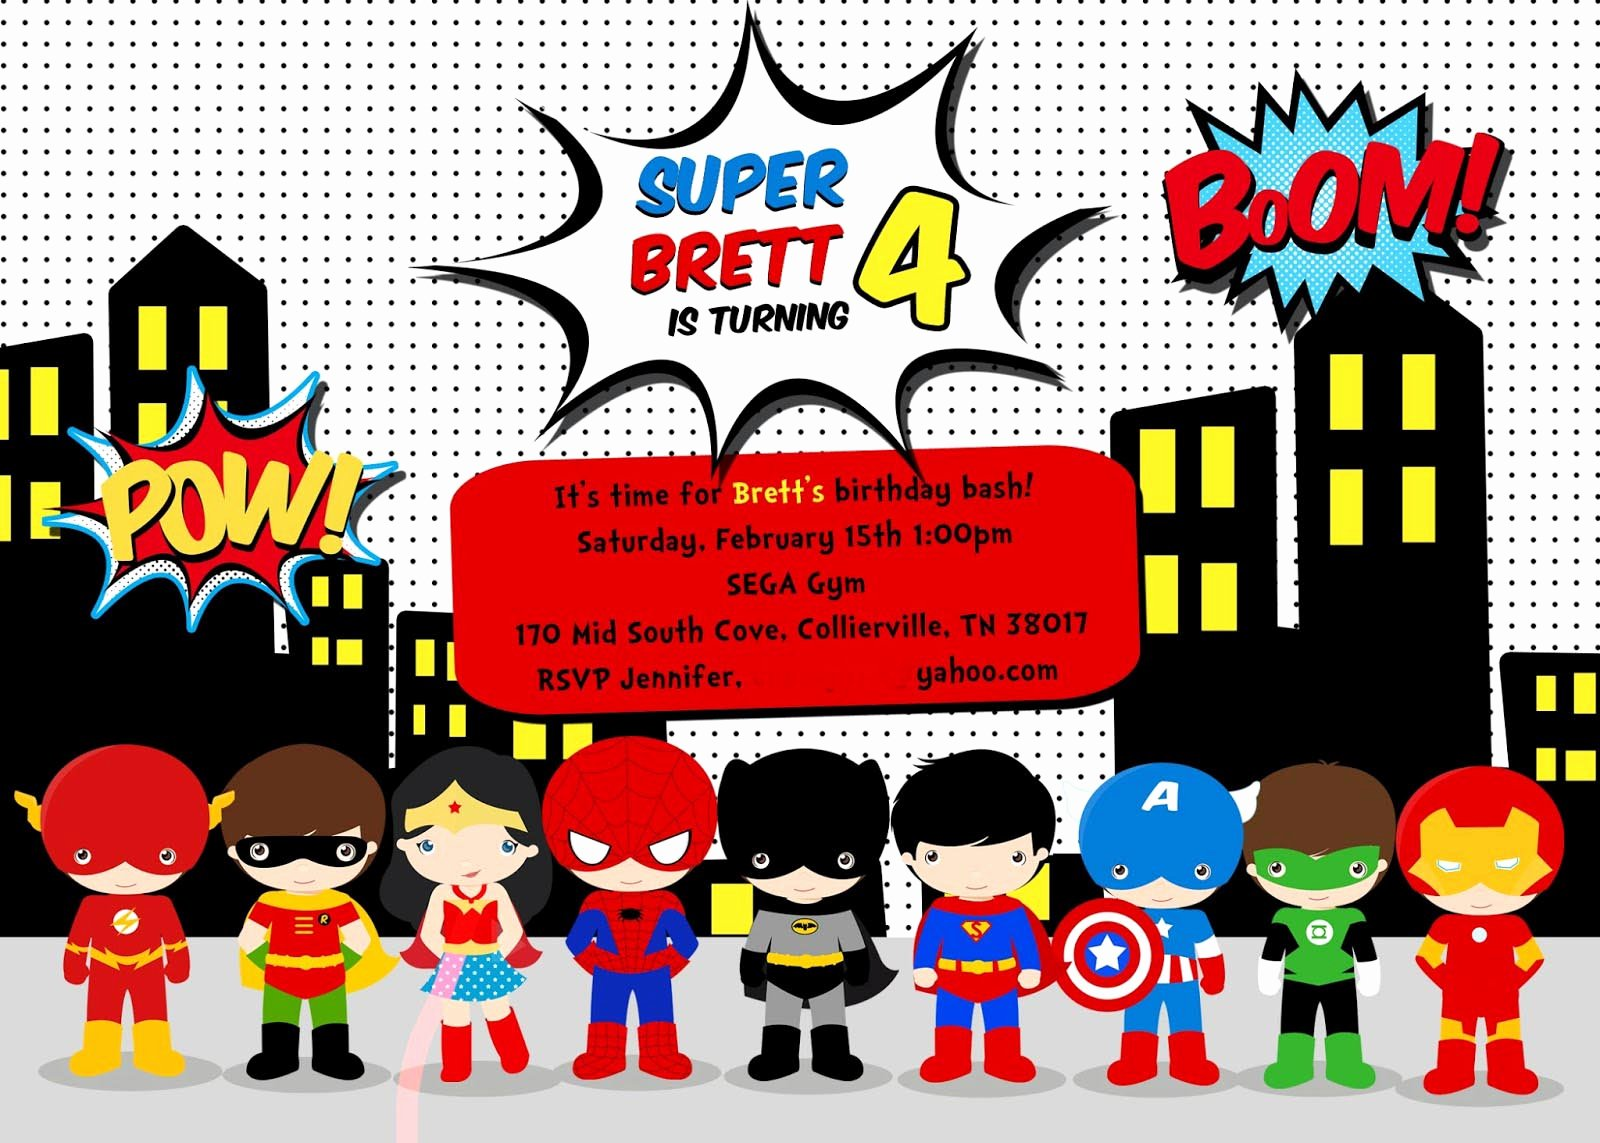 Free Superhero Invitation Templates New Free Superhero Birthday Party Invitation Templates